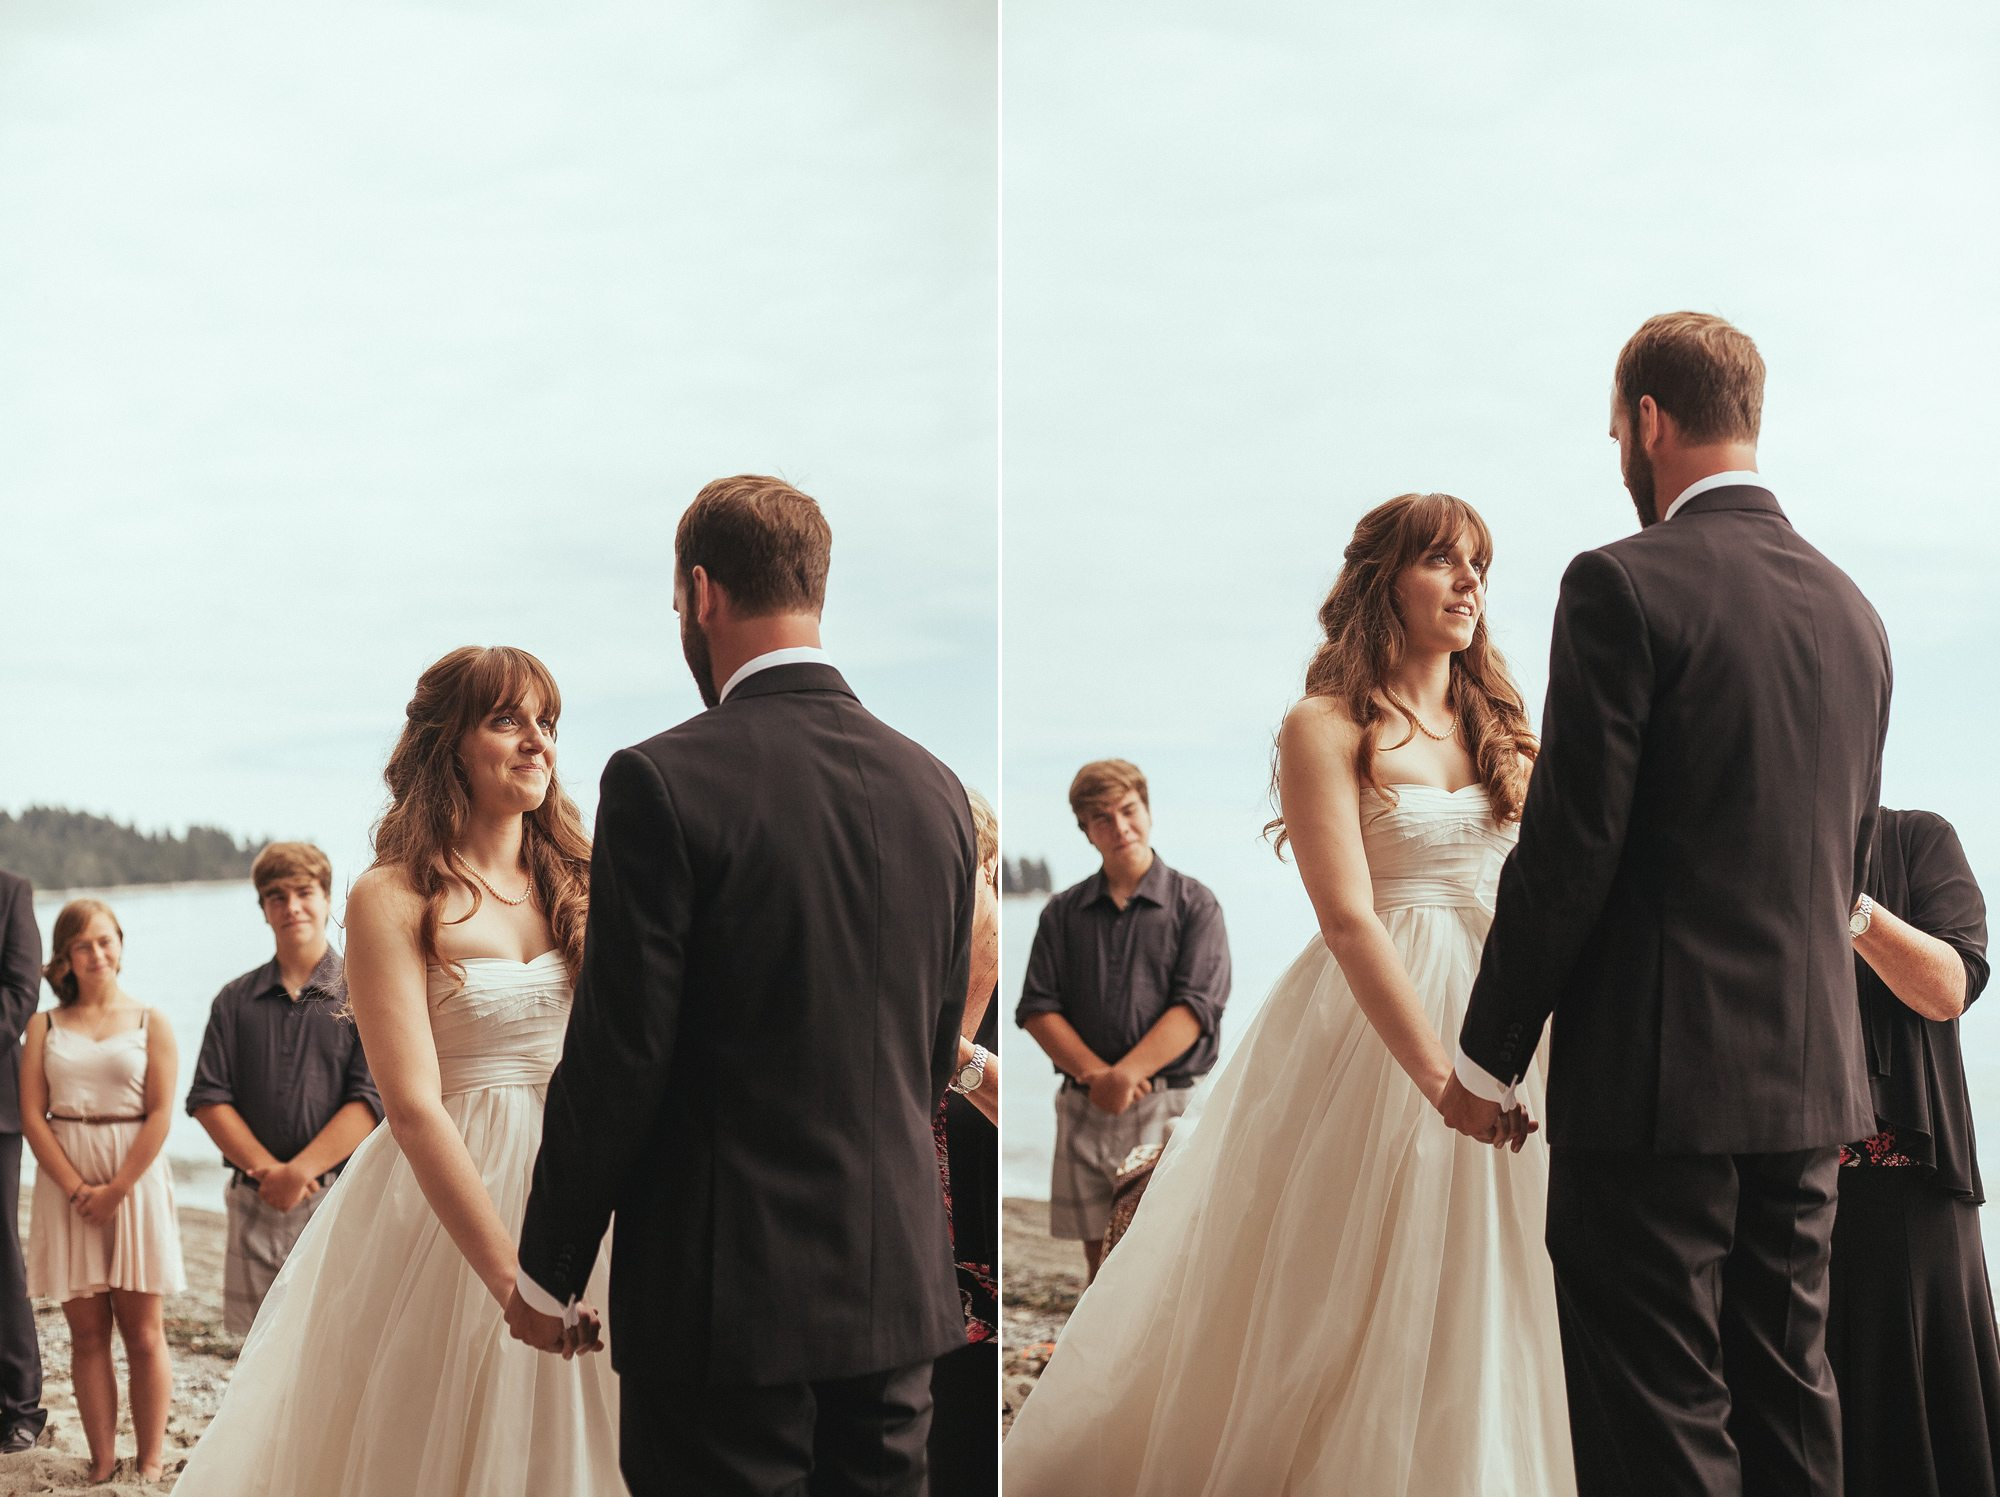 gibsons-wedding-photography-robert-devon27